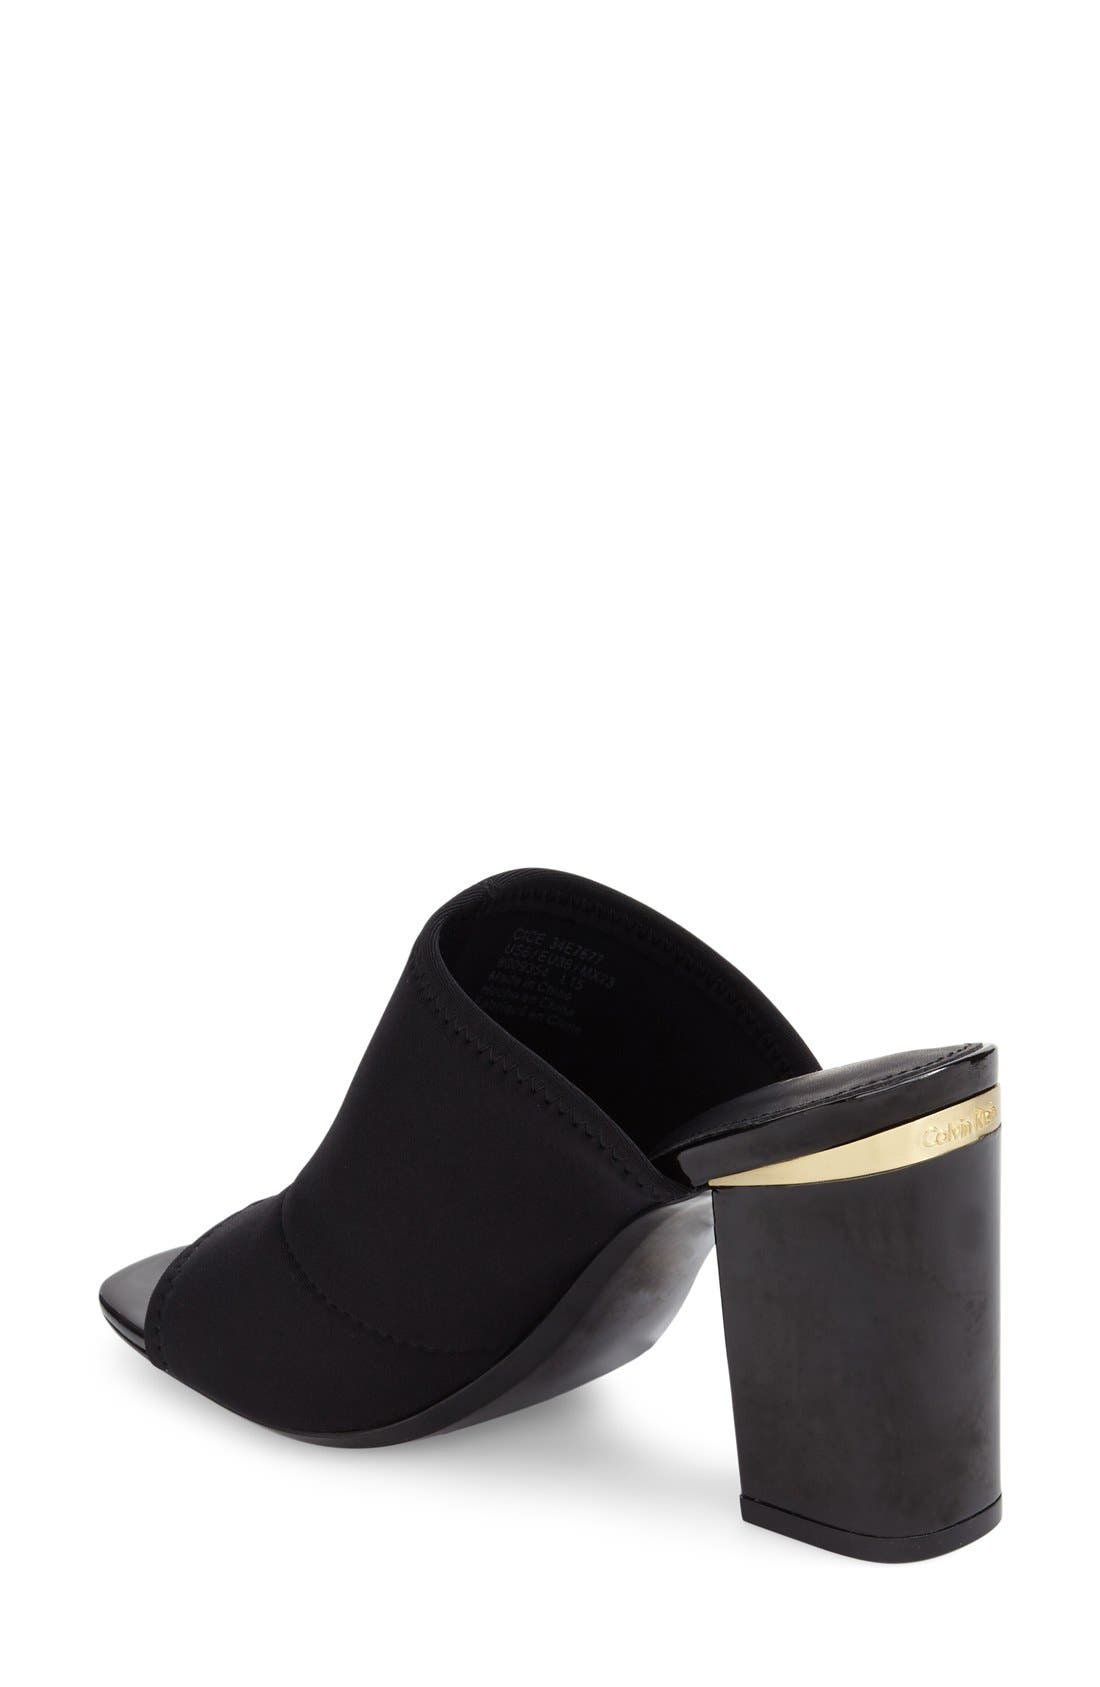 Alternate Image 2  - Calvin Klein 'Cice' Mule Sandal (Women)